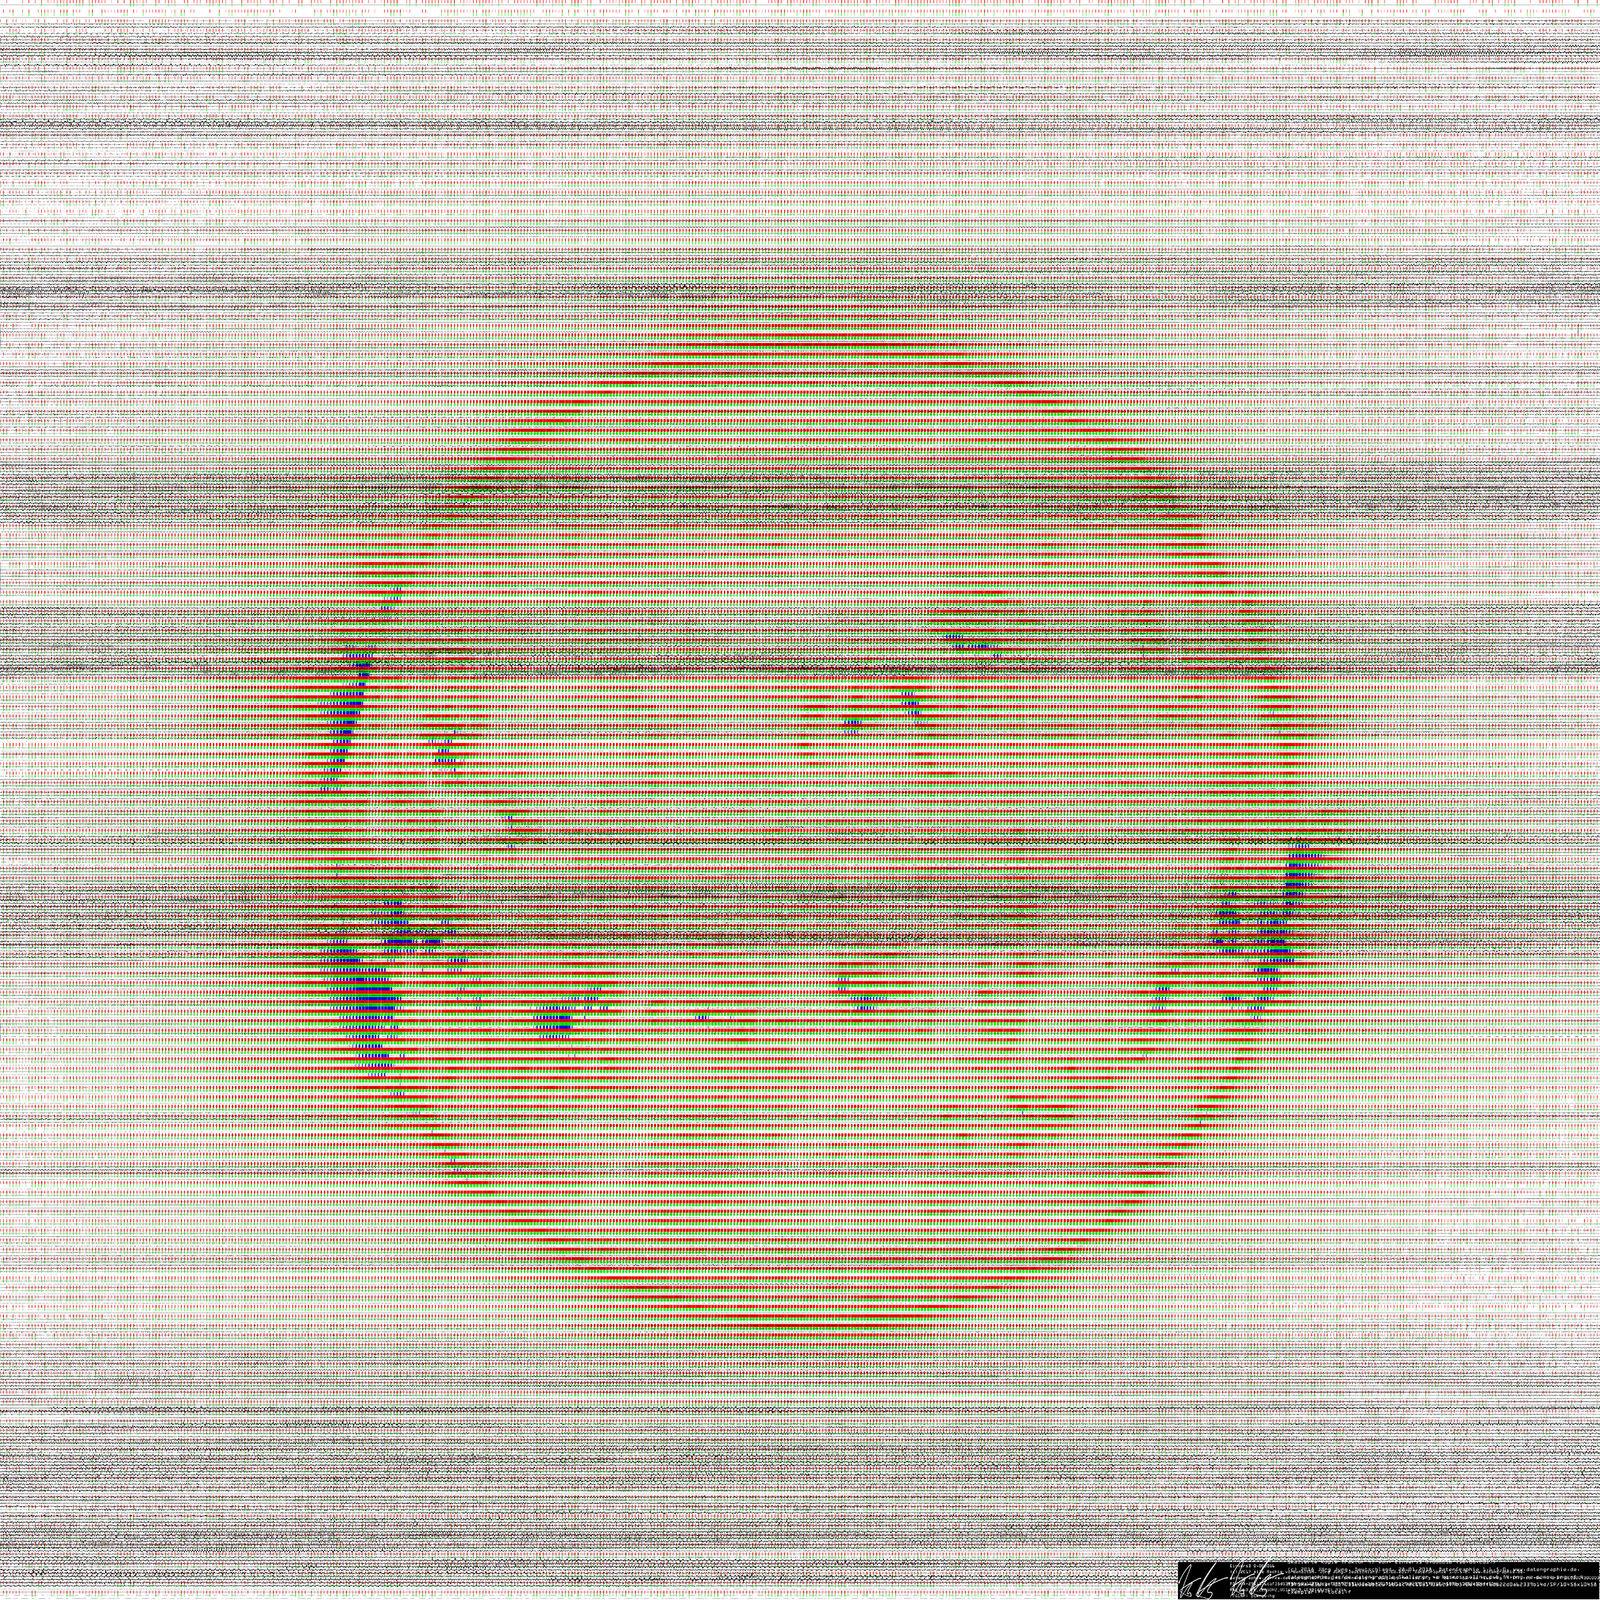 datagrafy: kosmos: 0,000016 by datengraphie